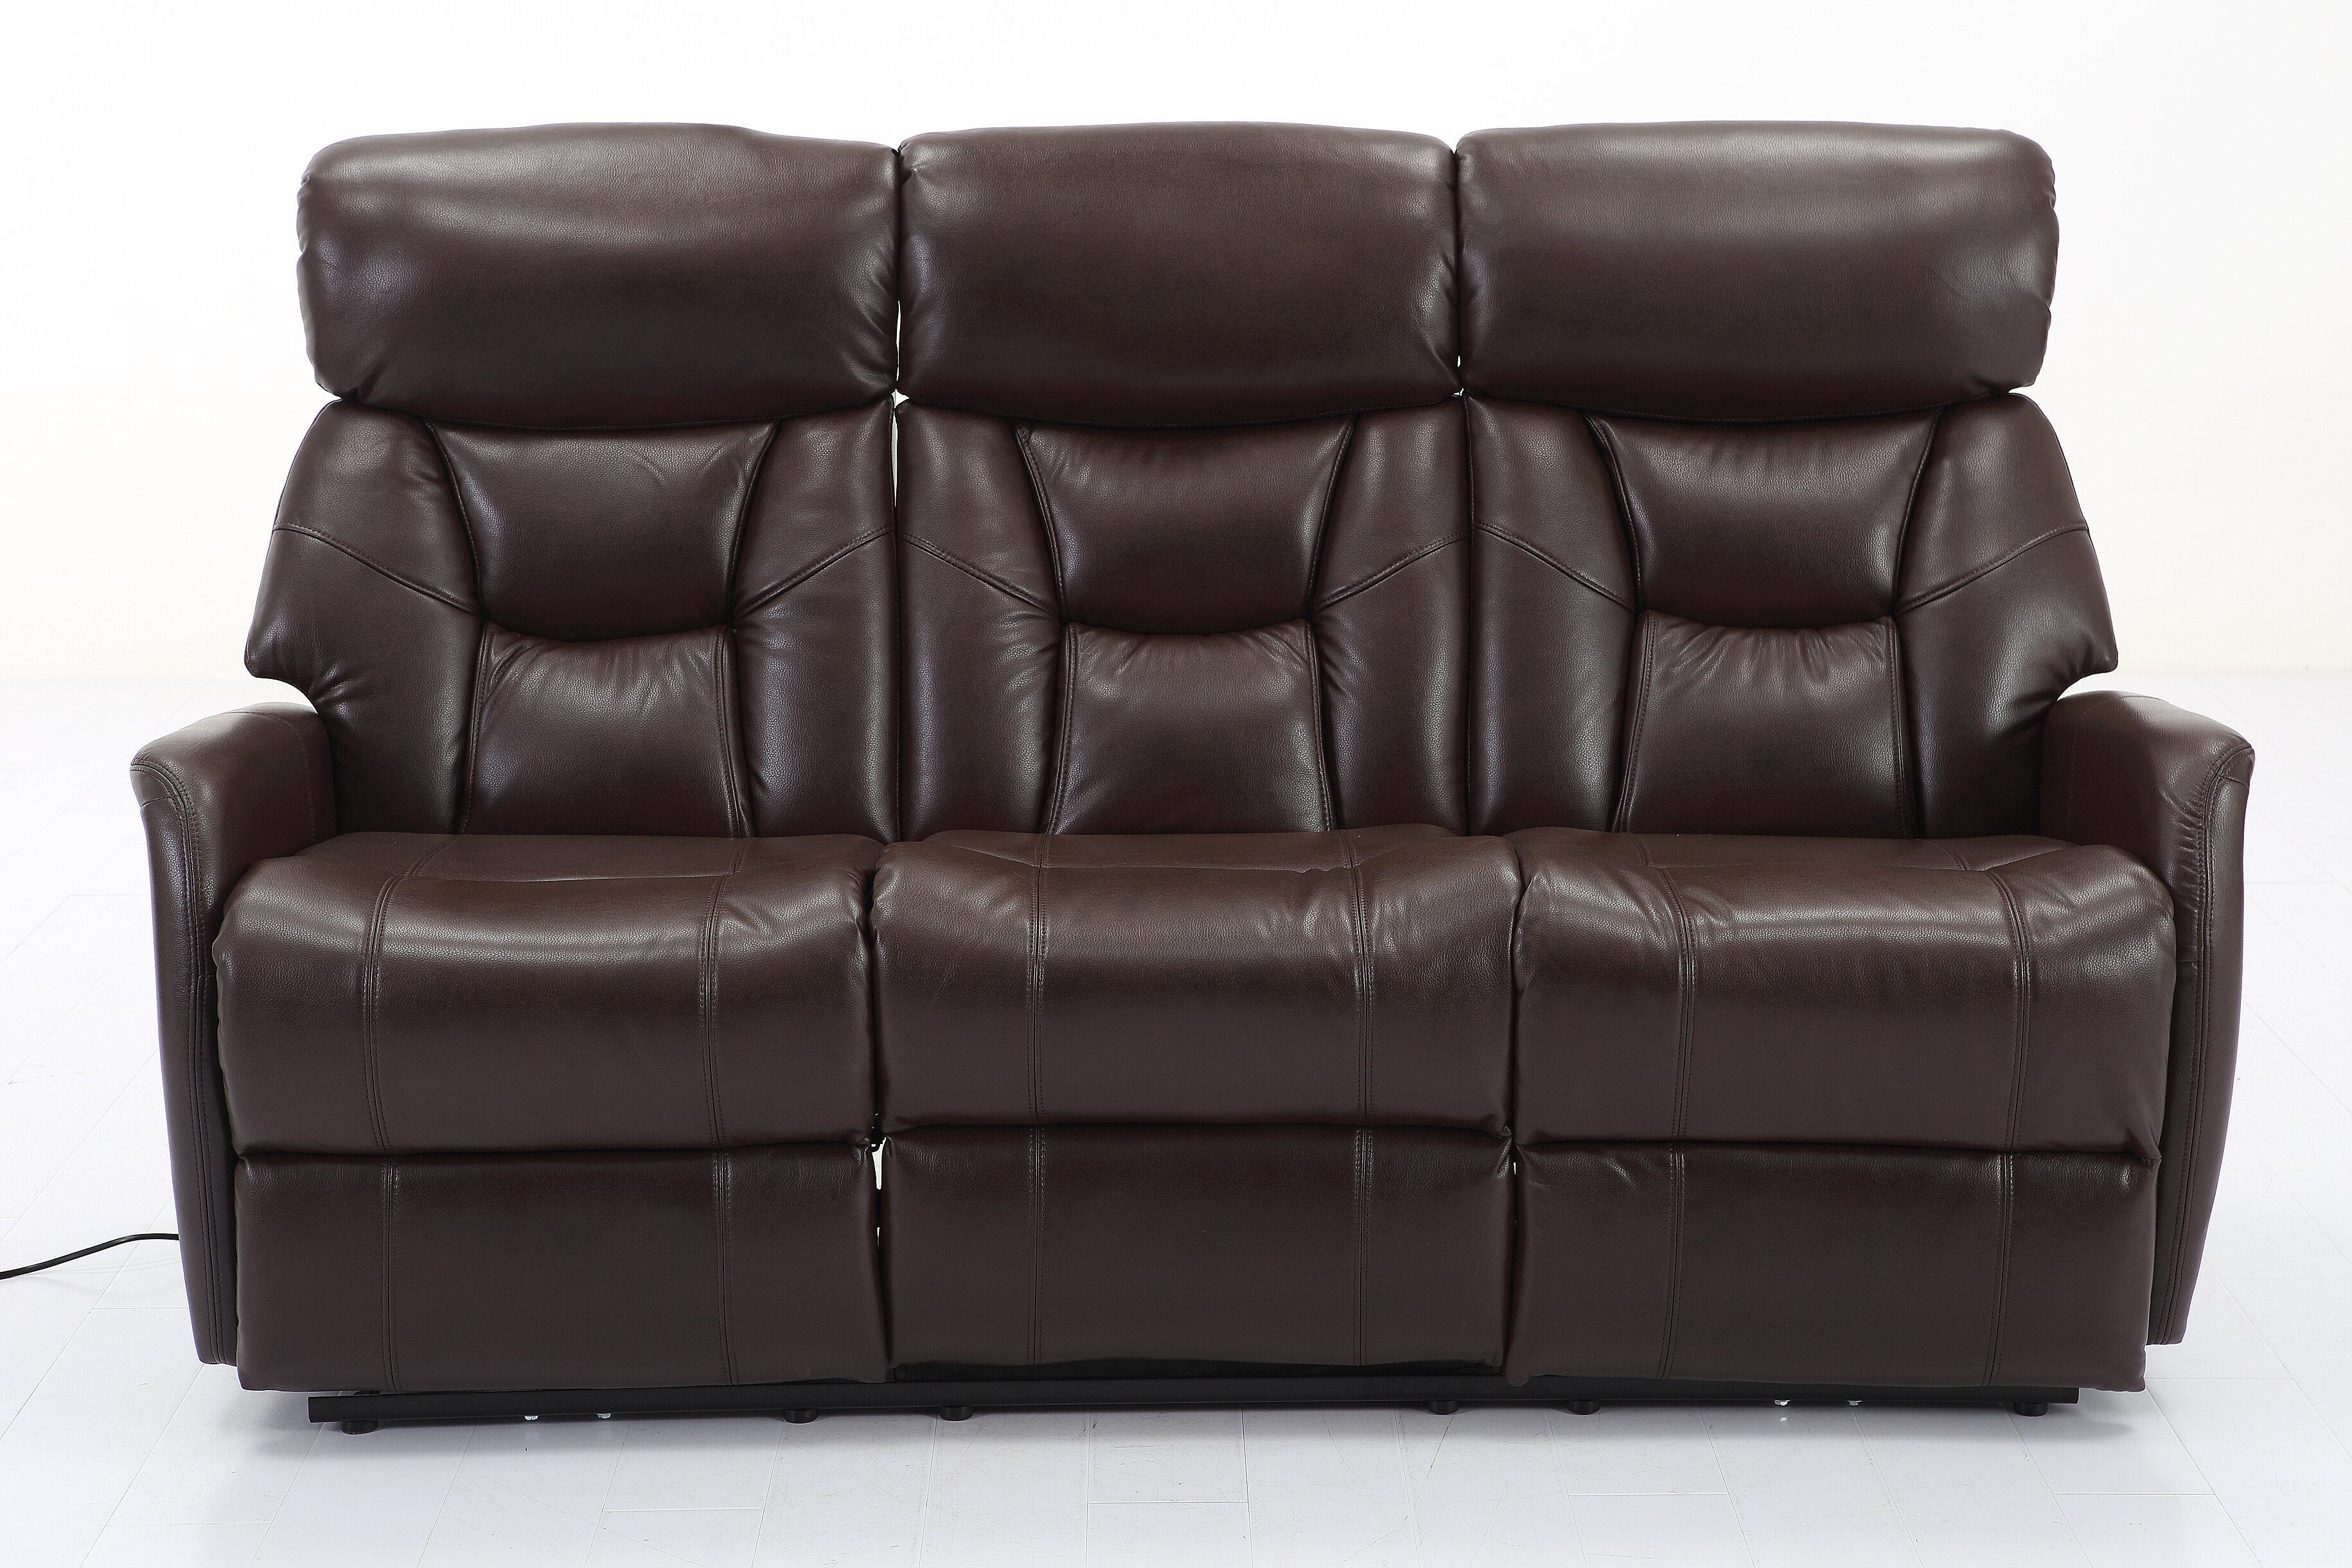 Sensational Damato Dual Reclining Sofa Andrewgaddart Wooden Chair Designs For Living Room Andrewgaddartcom